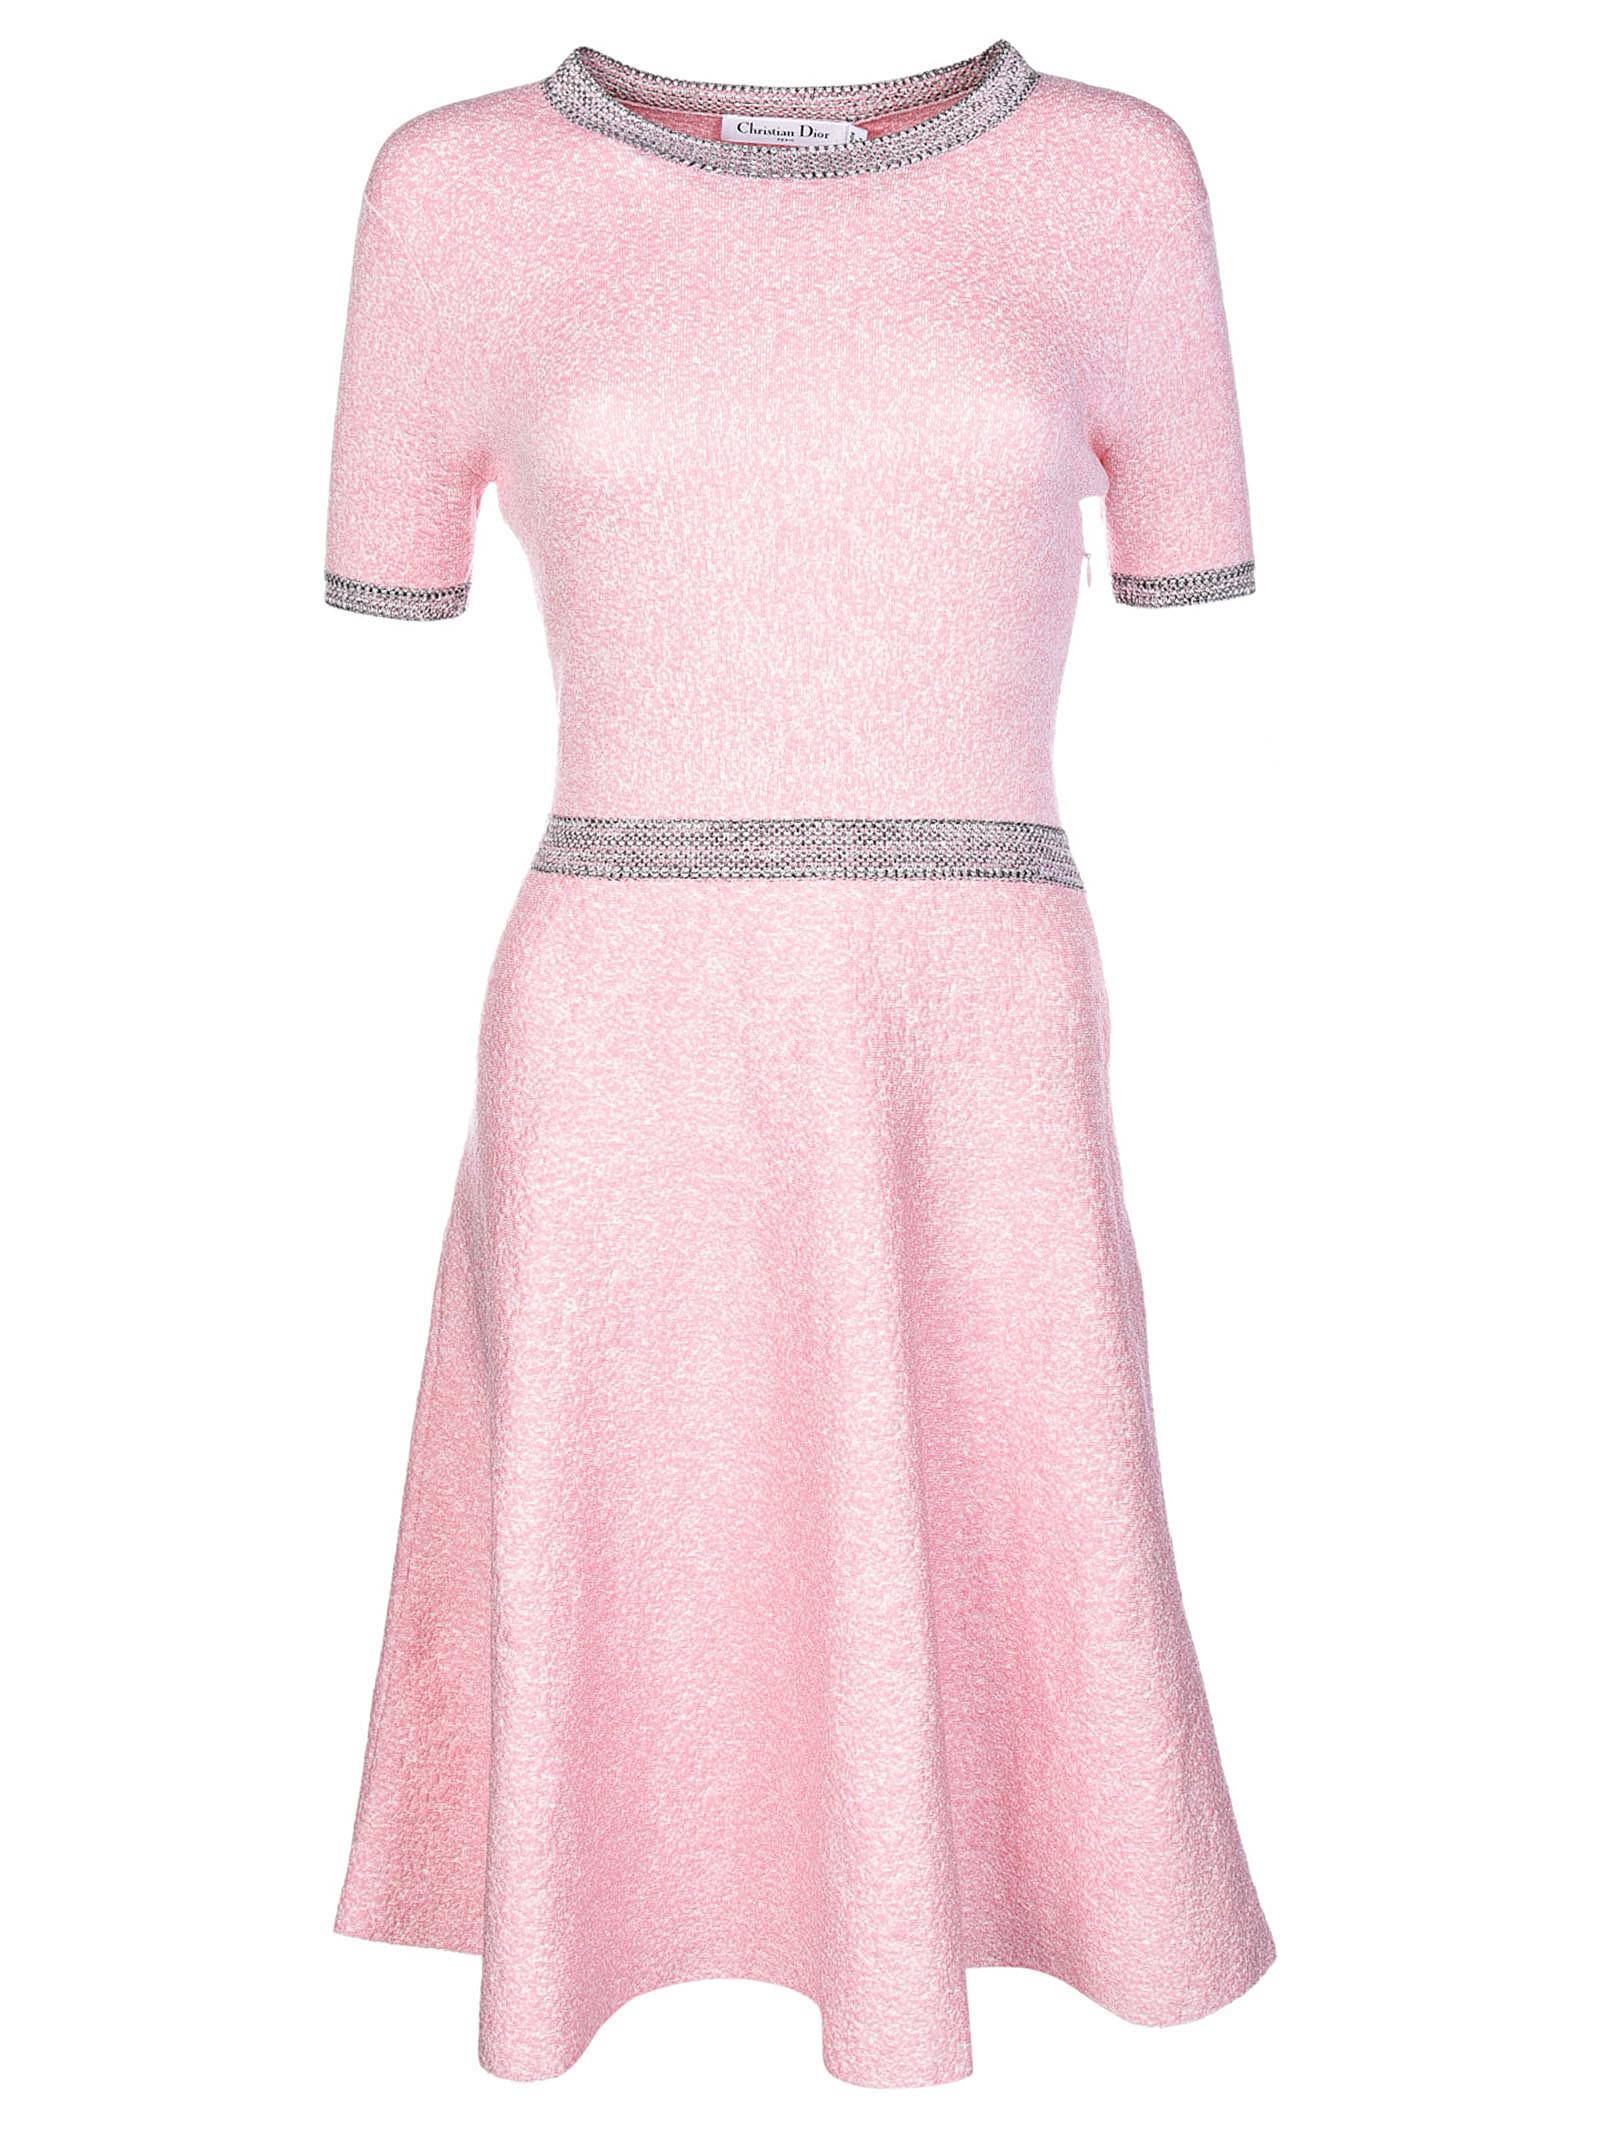 Christian Dior Flared Dress